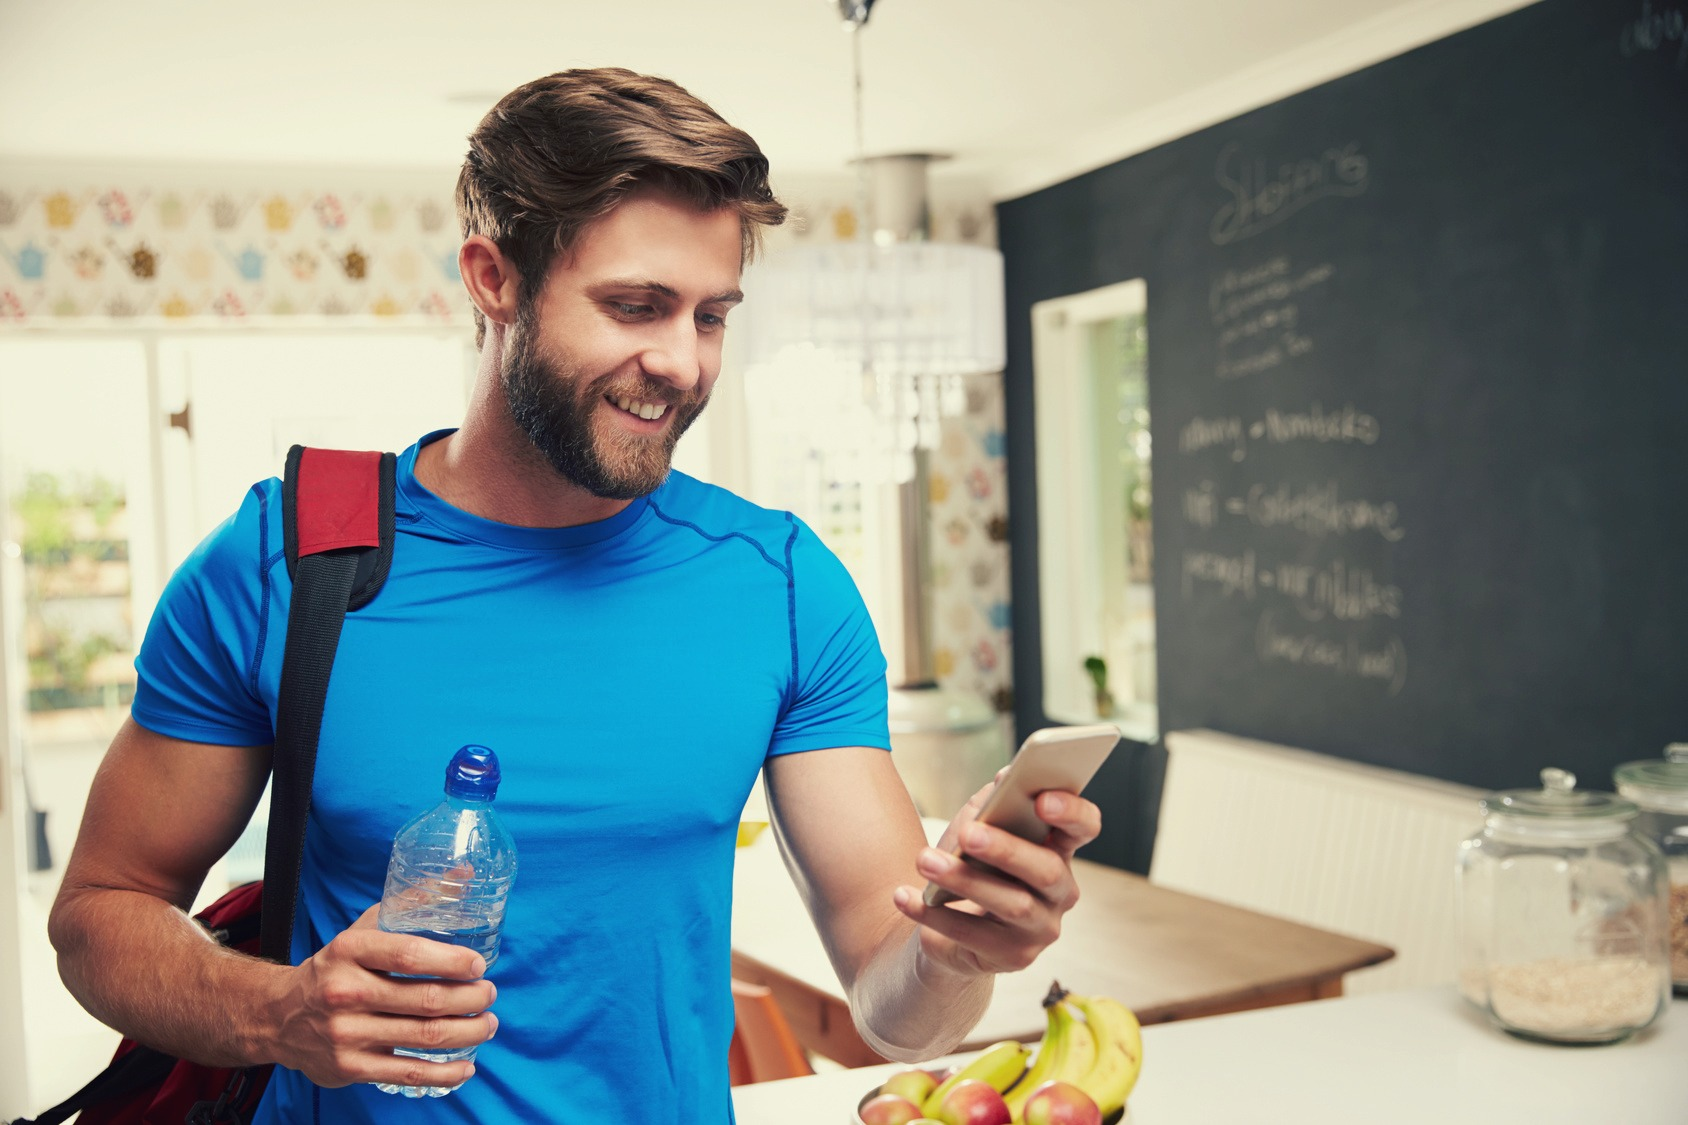 Man Wearing Gym Clothing Looking At Mobile Phone